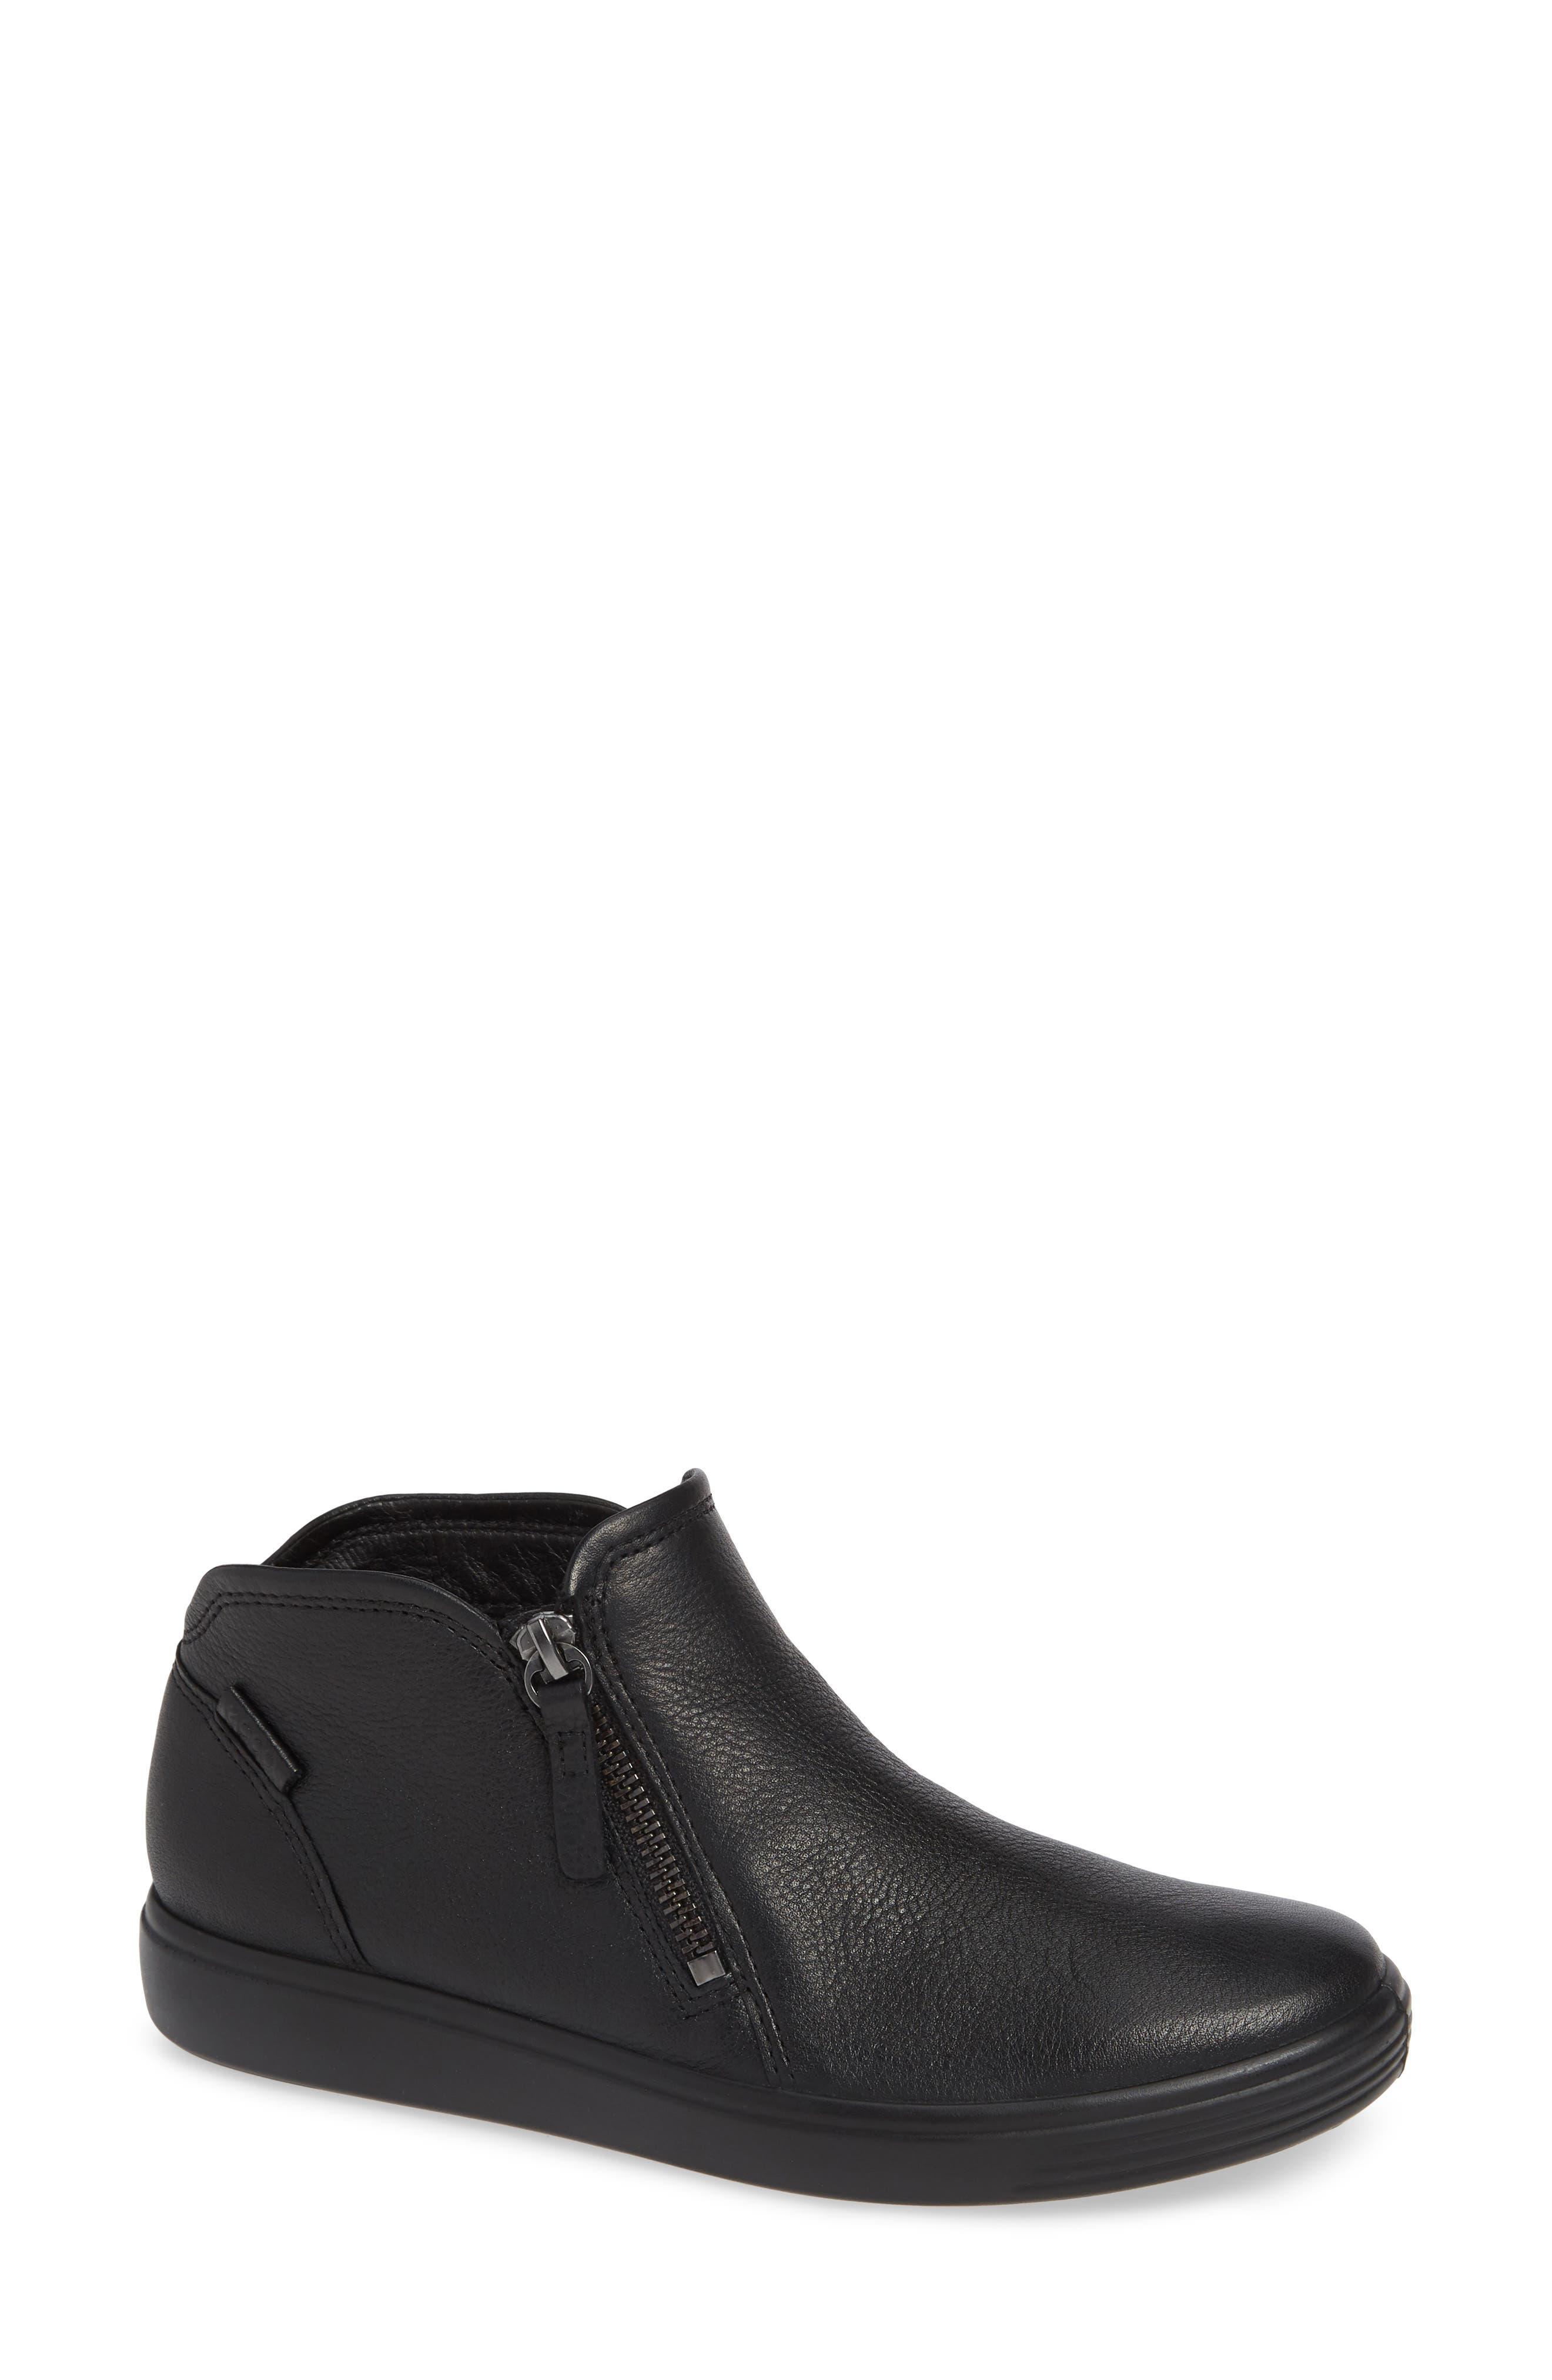 Soft 7 Mid Top Sneaker,                             Main thumbnail 1, color,                             BLACK/ BLACK LEATHER